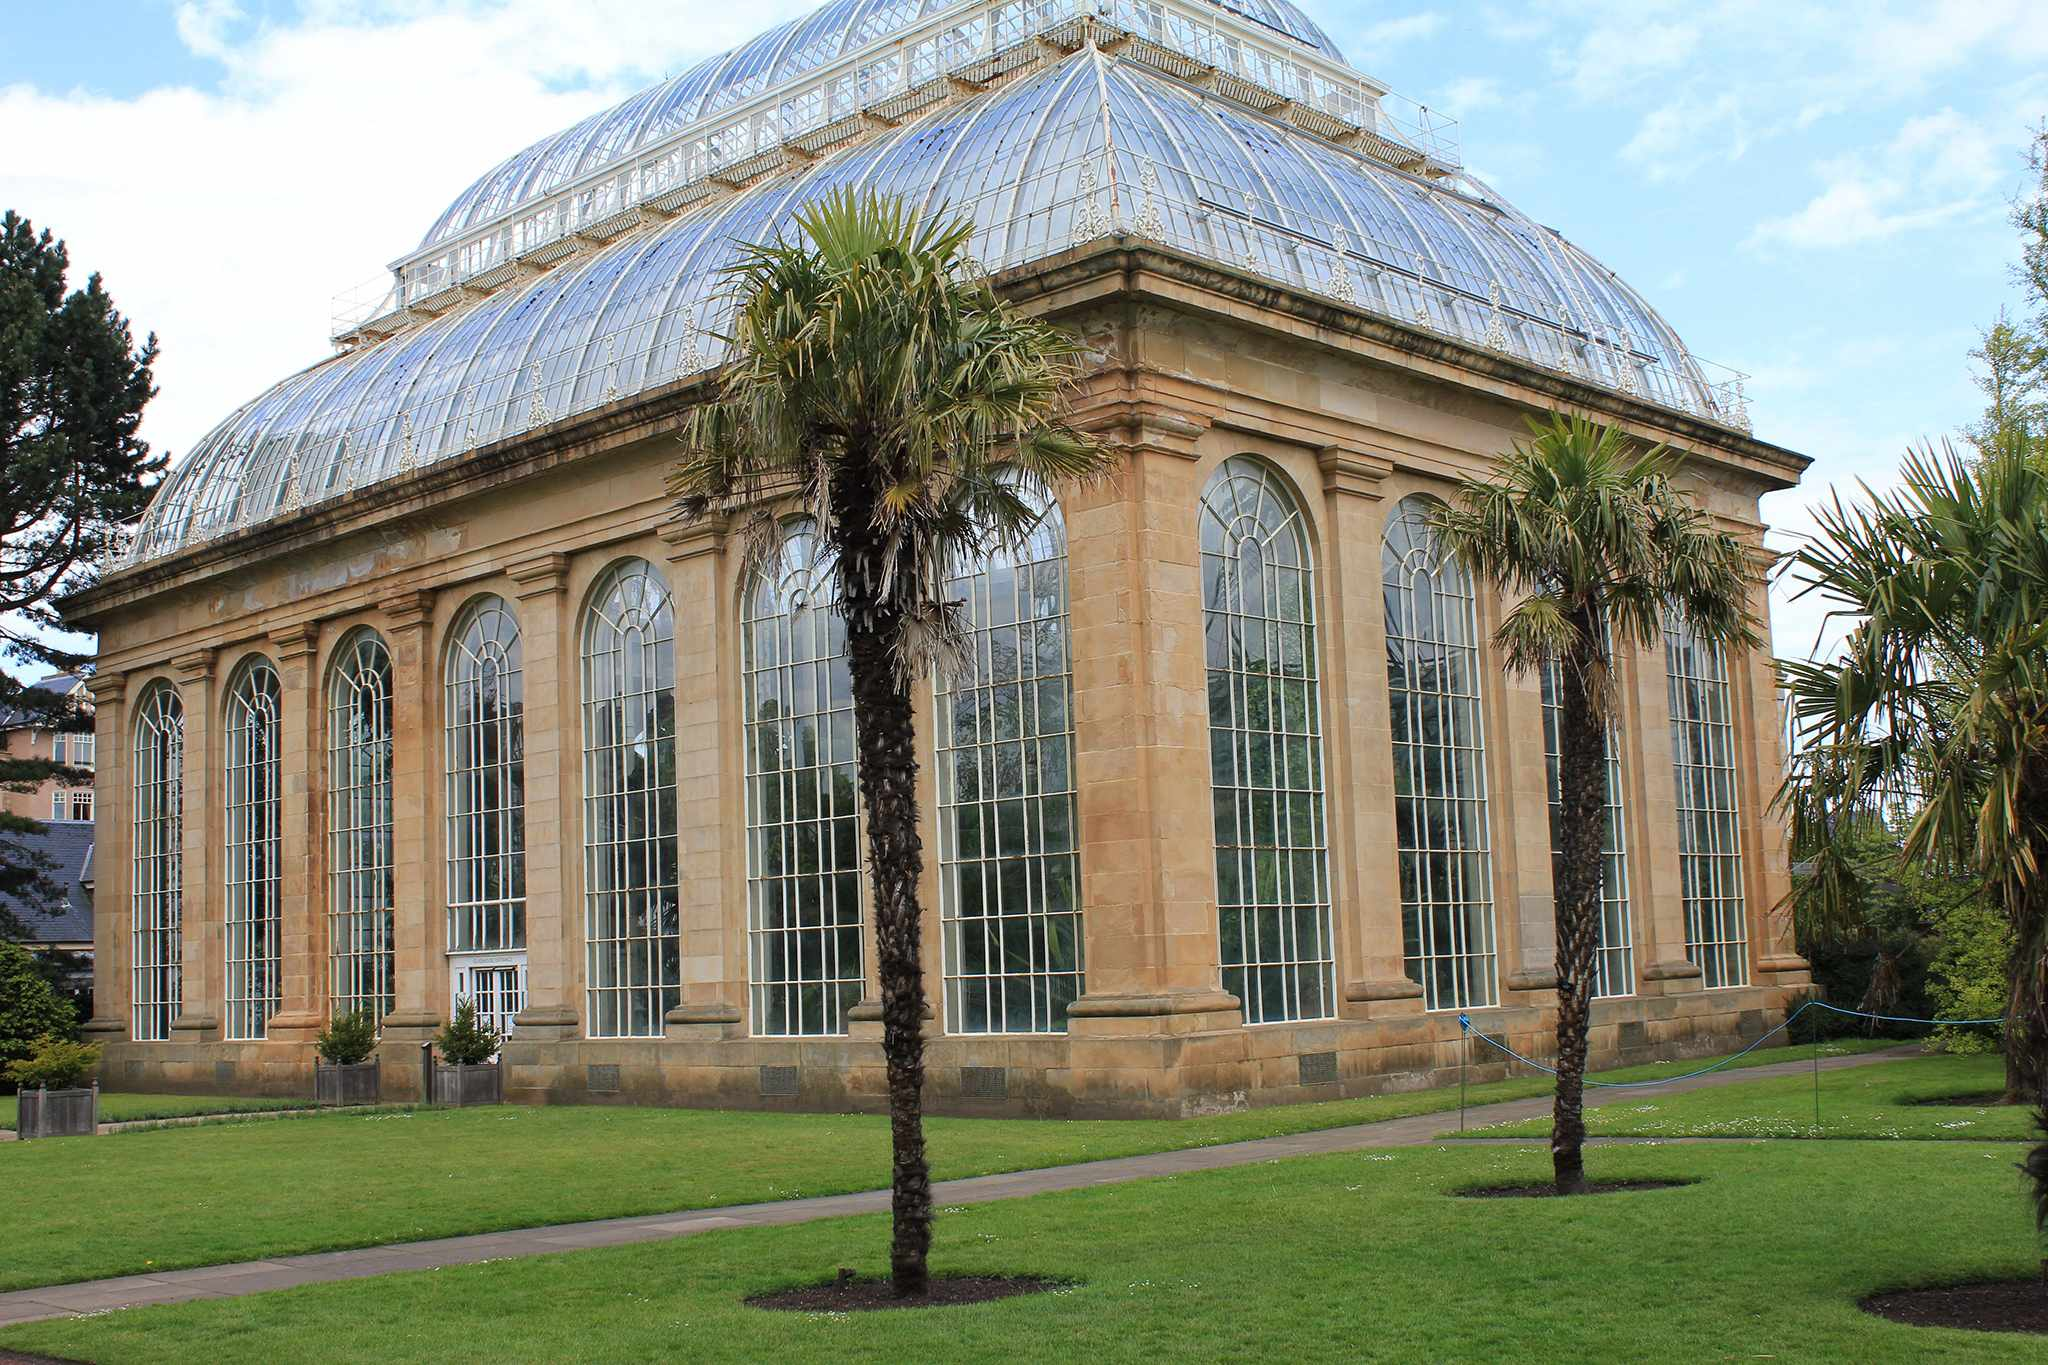 Connoisseur Travel - Royal Botanic Gardens Edinburgh